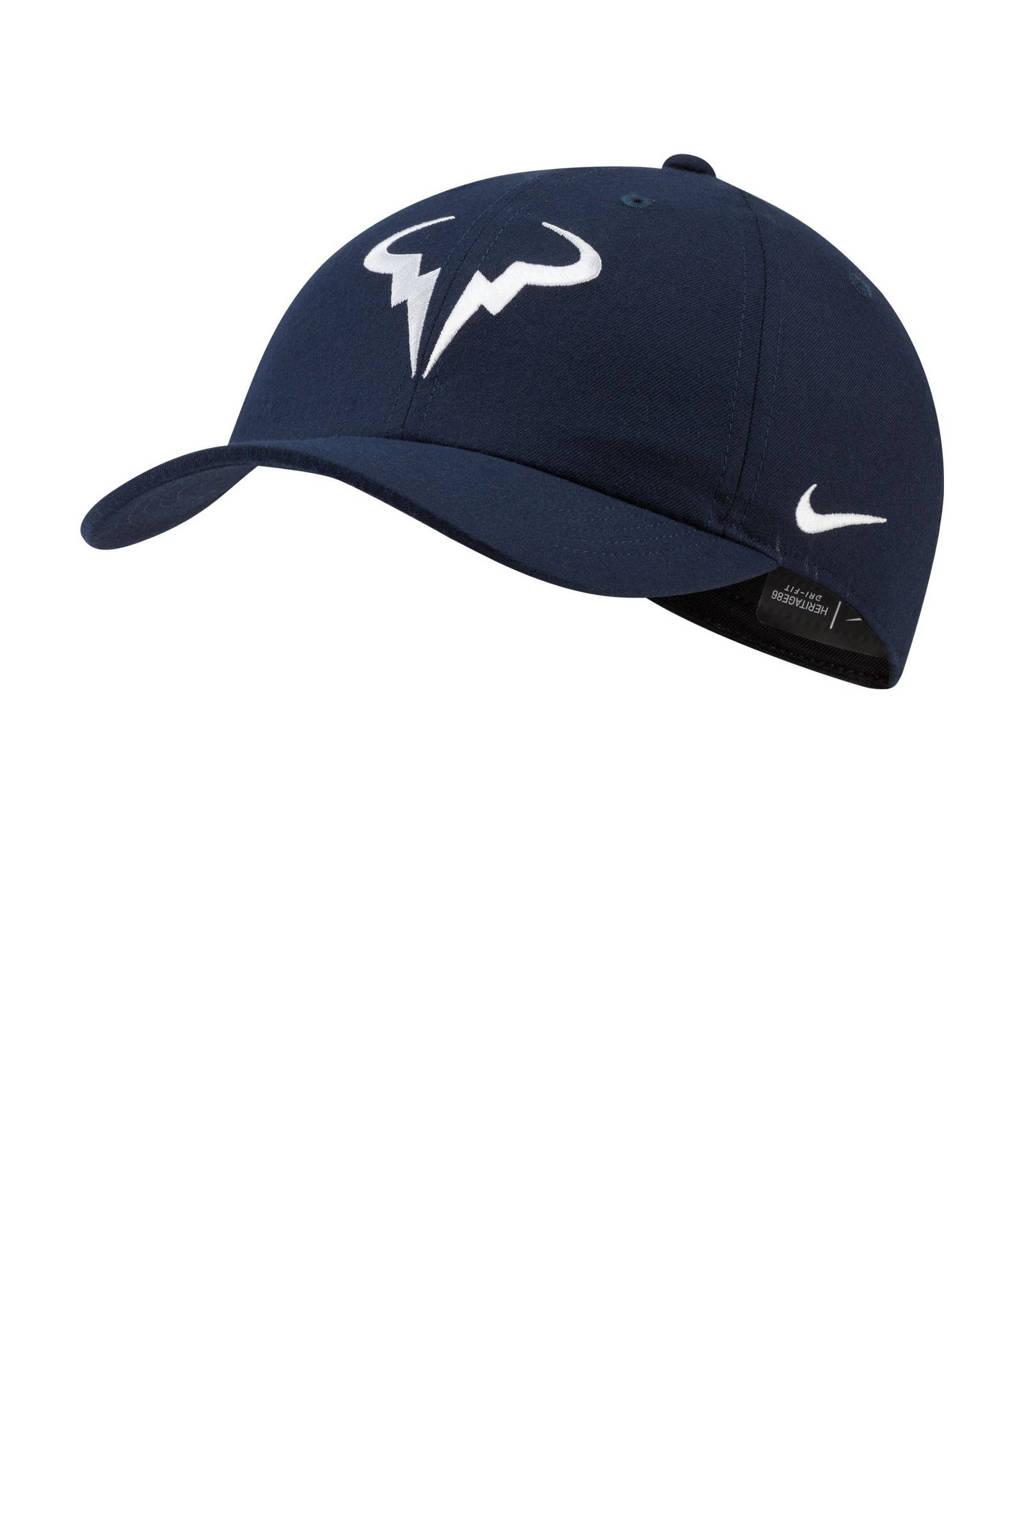 Nike pet donkerblauw